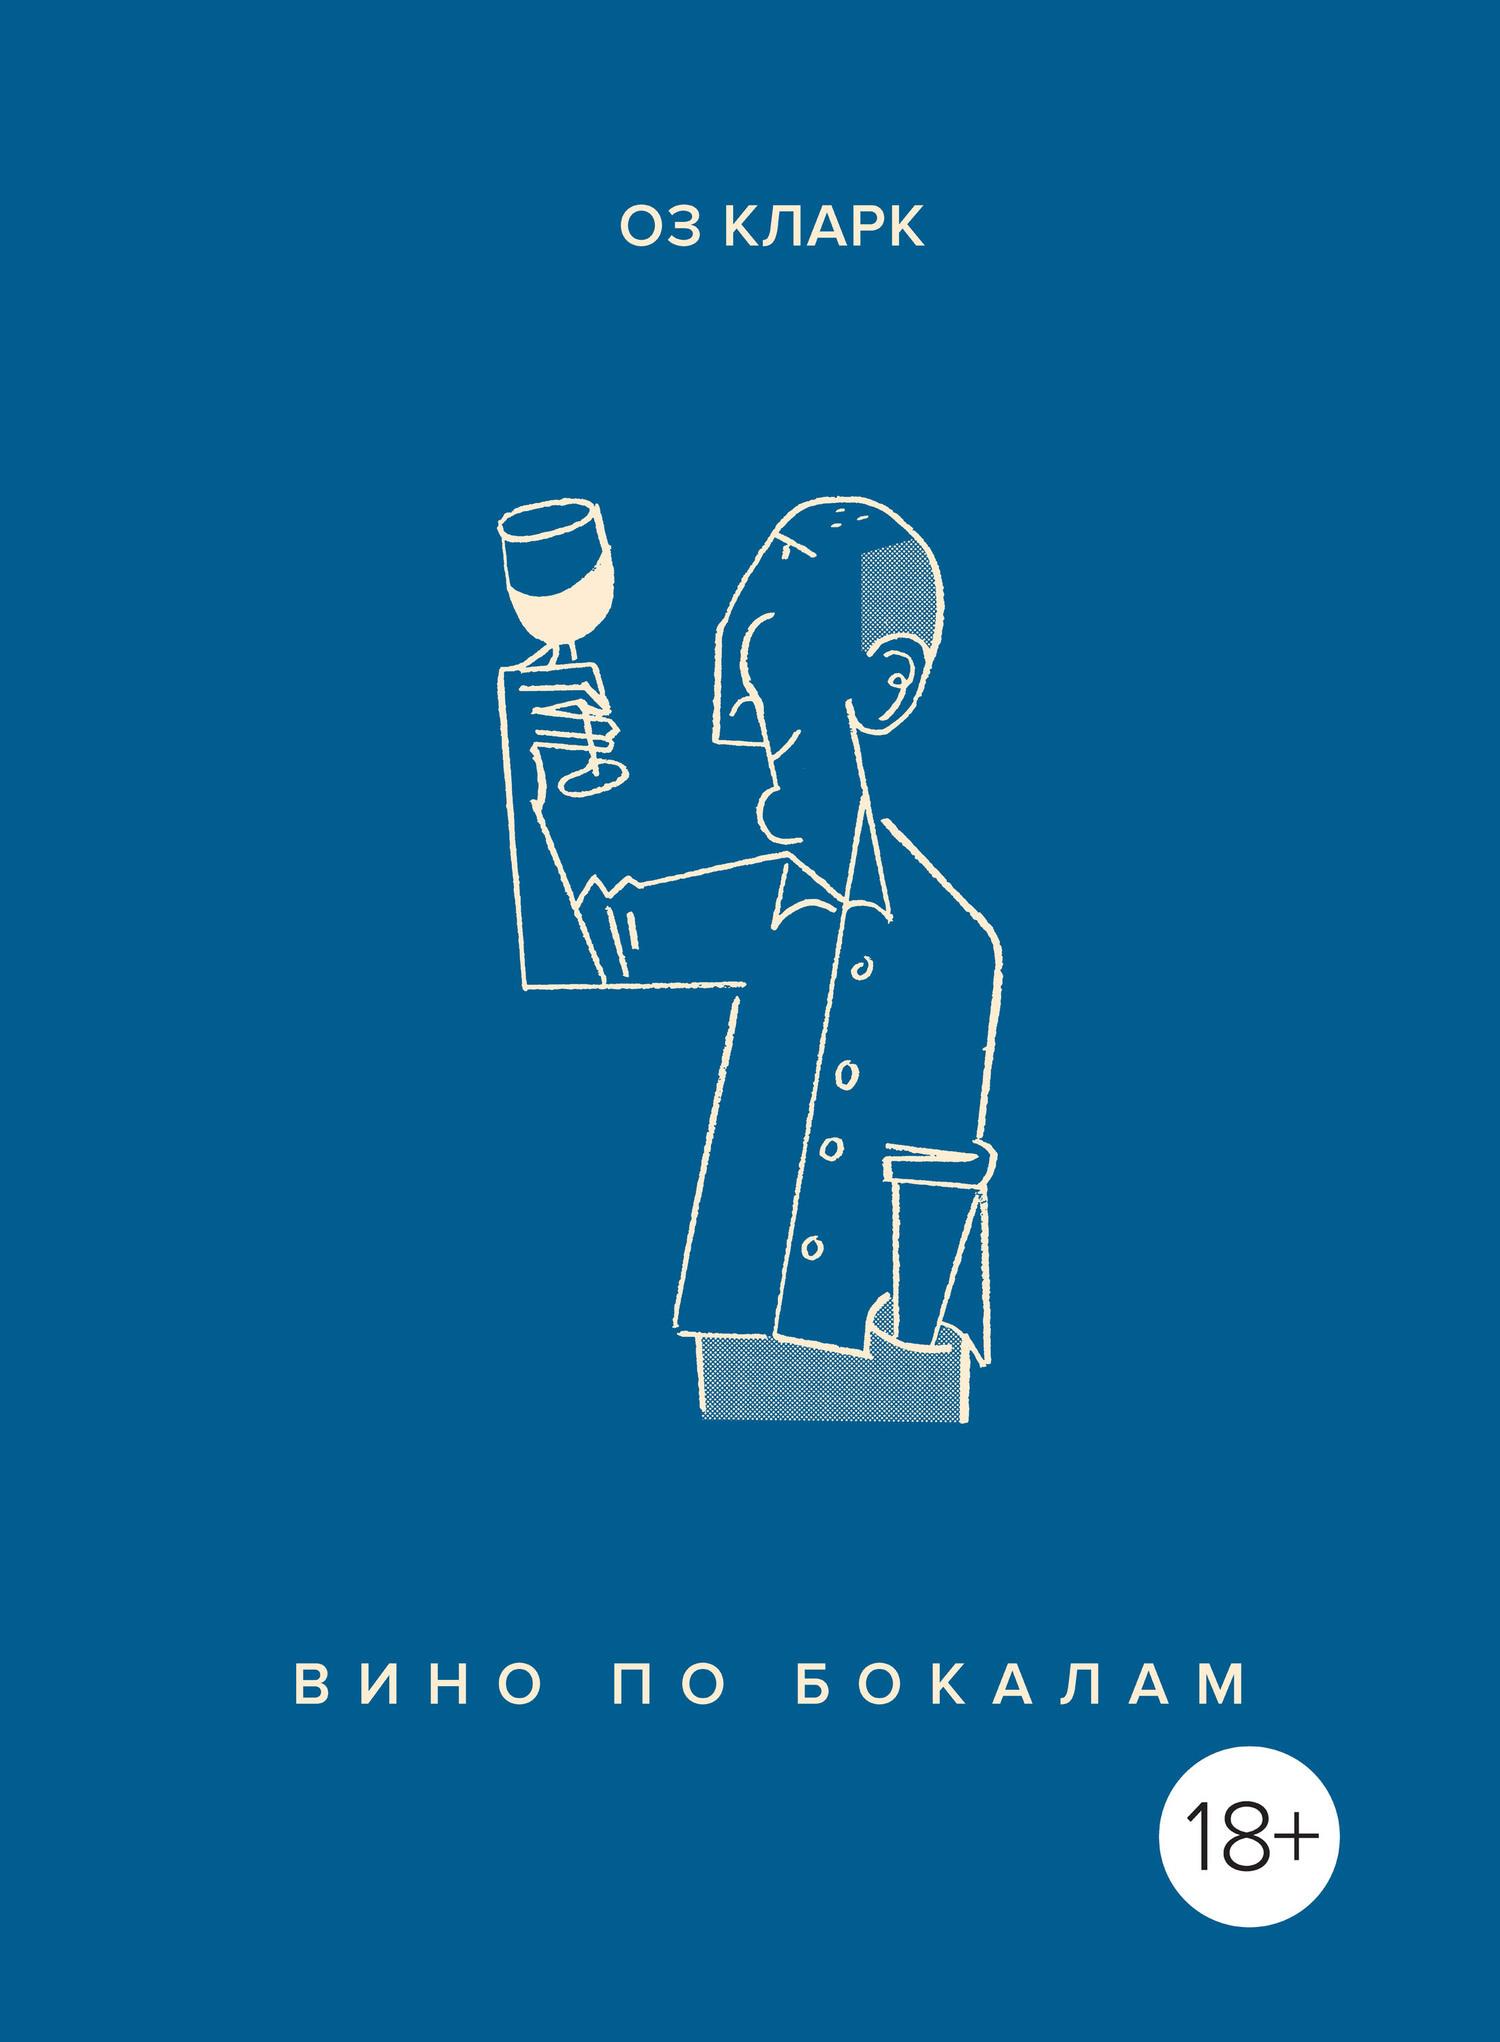 Оз Кларк - Вино по бокалам